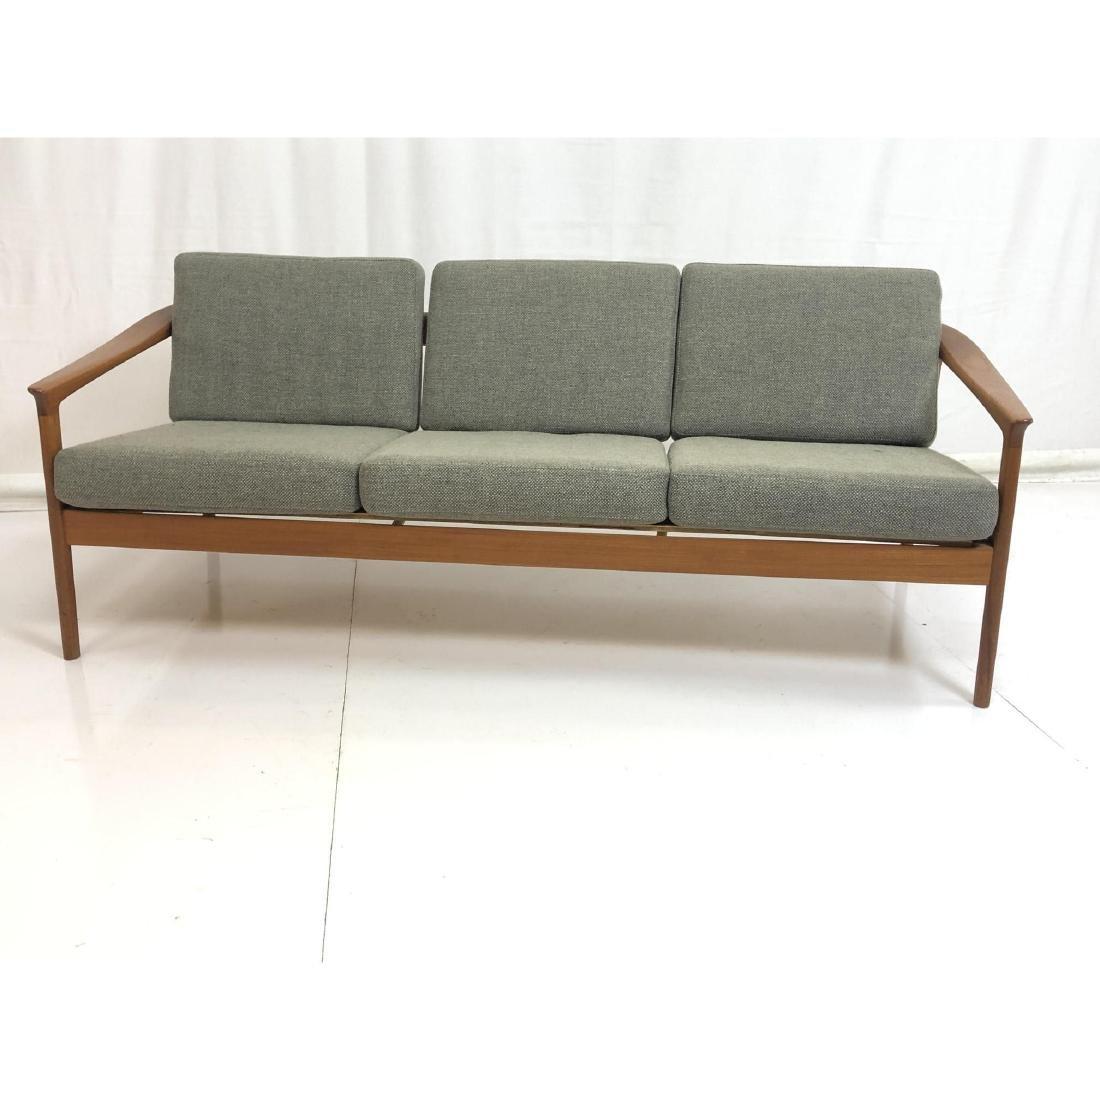 FOLKE OHLSSON Danish Modern Teak Sofa Couch . Ele - 3